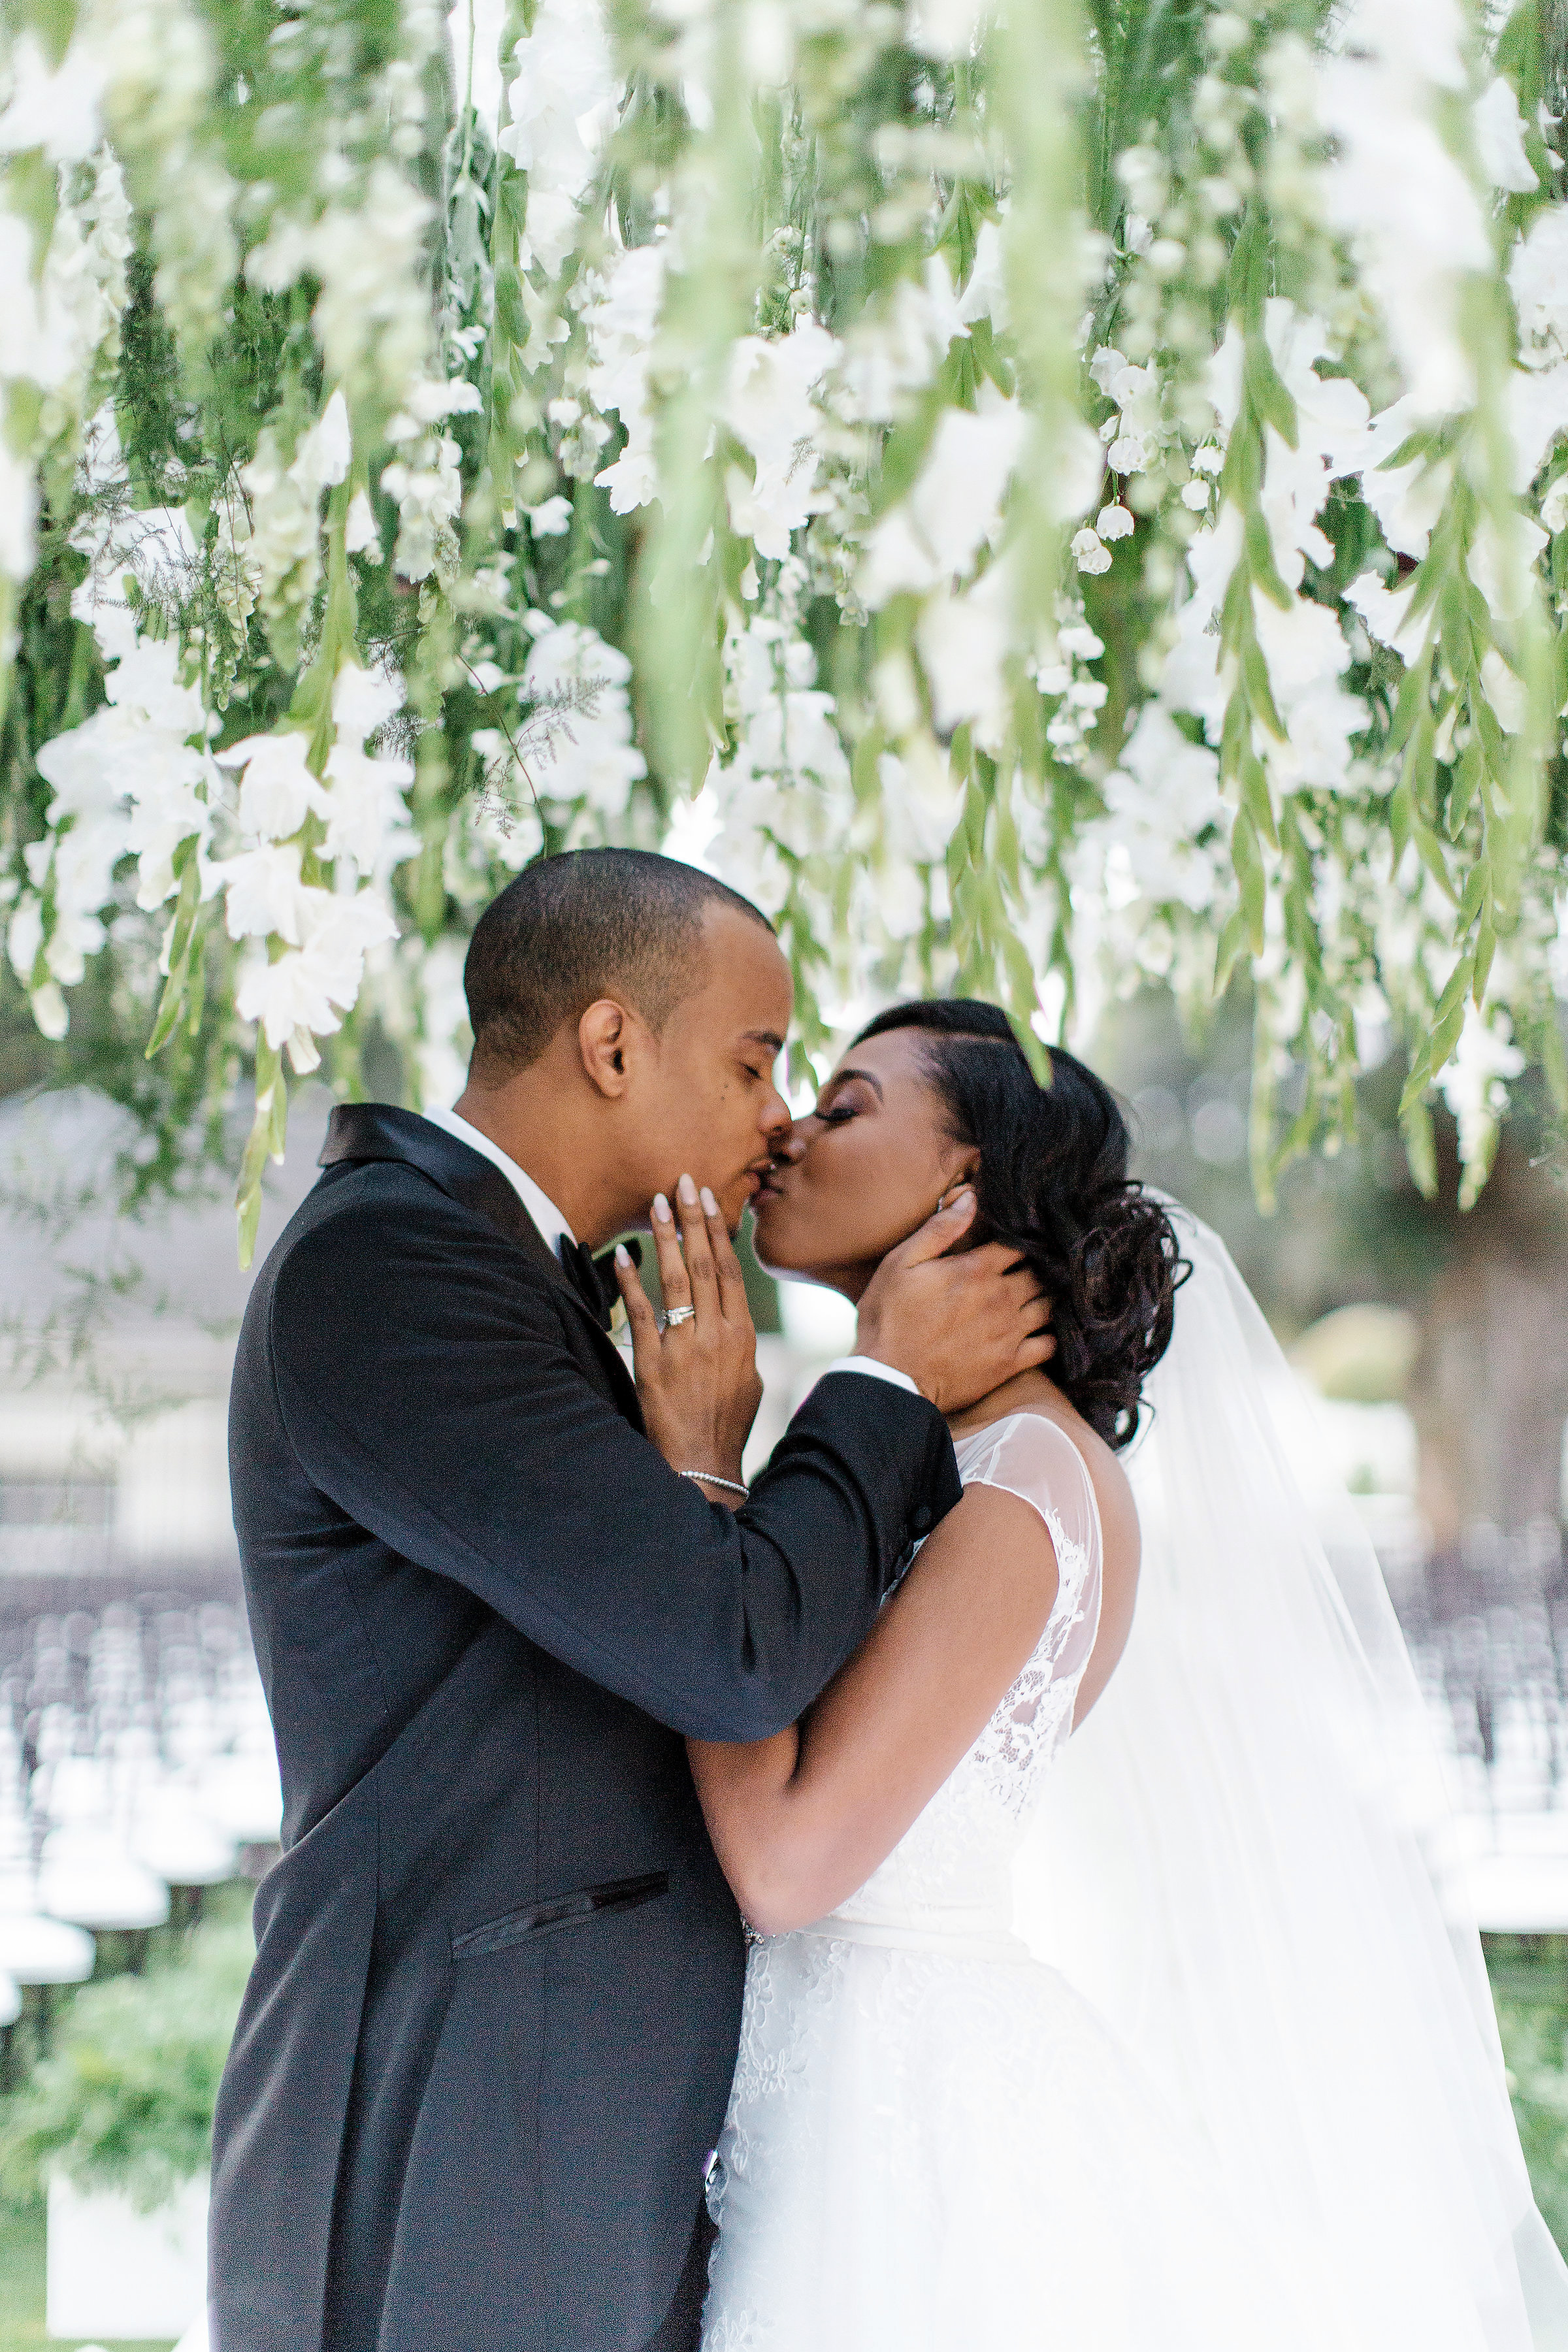 chloe shayo south africa wedding first kiss couple